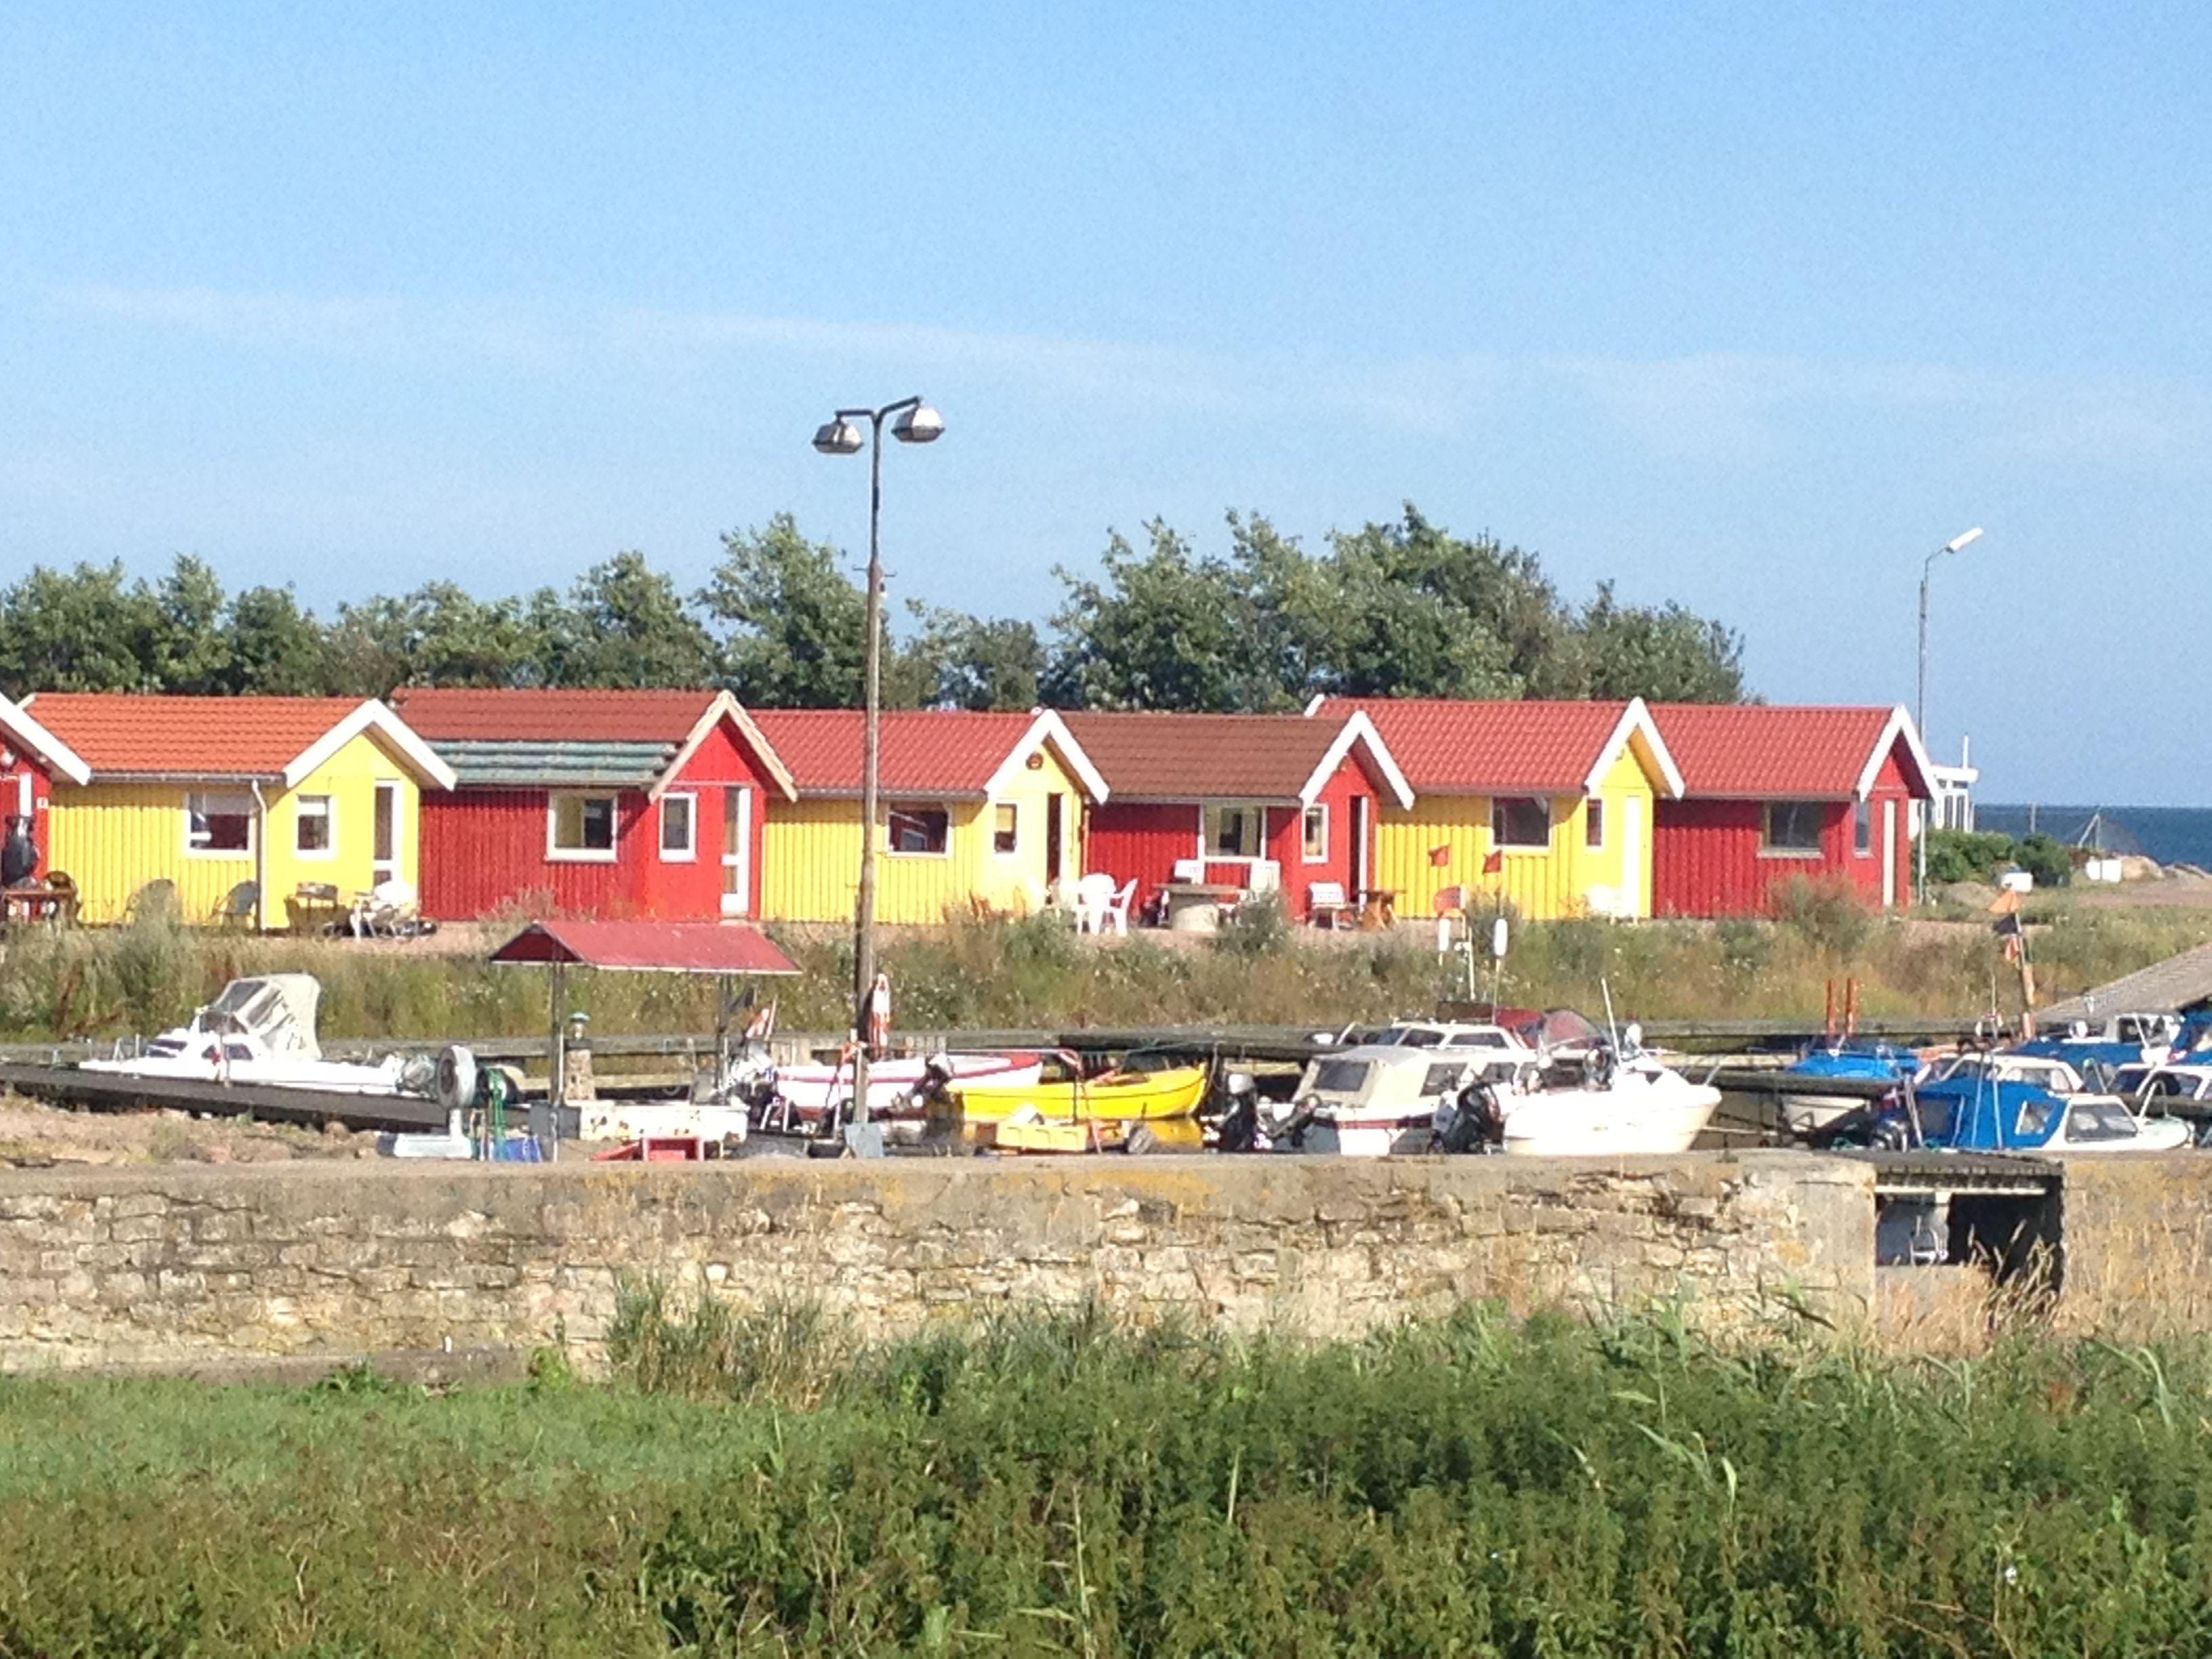 #Bornholm #SailingRallies #Baltic4Nations